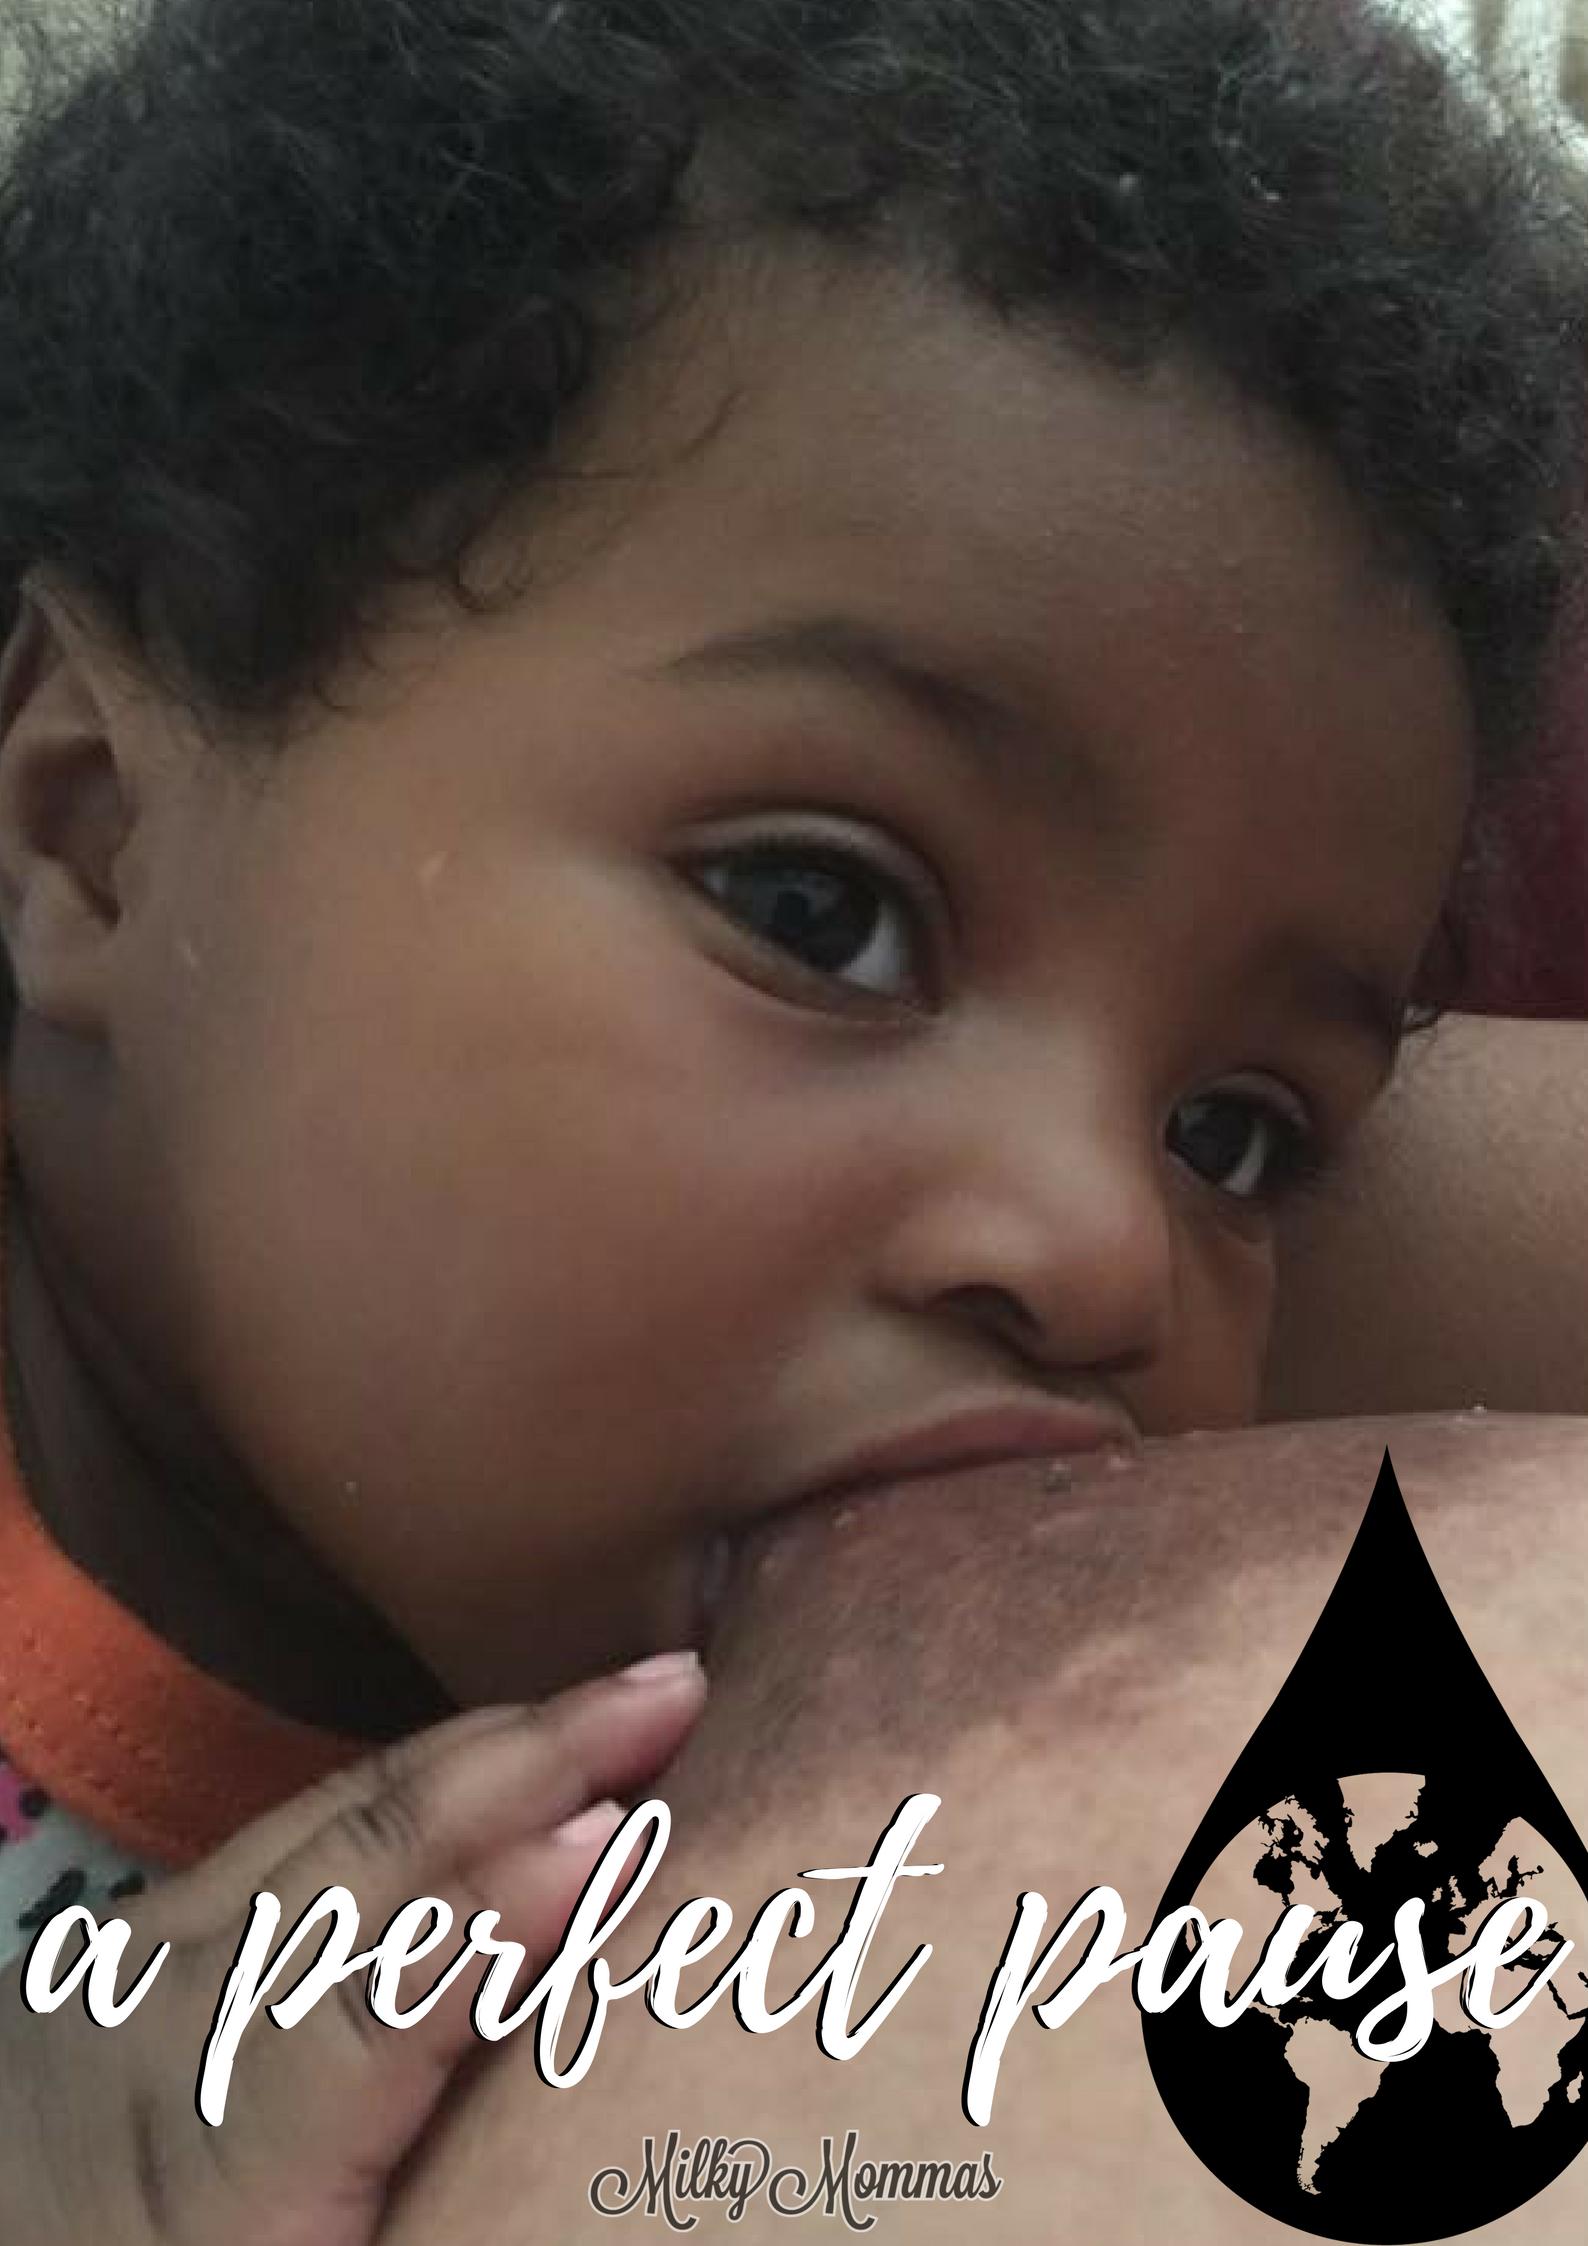 Lactating pregnant black woman